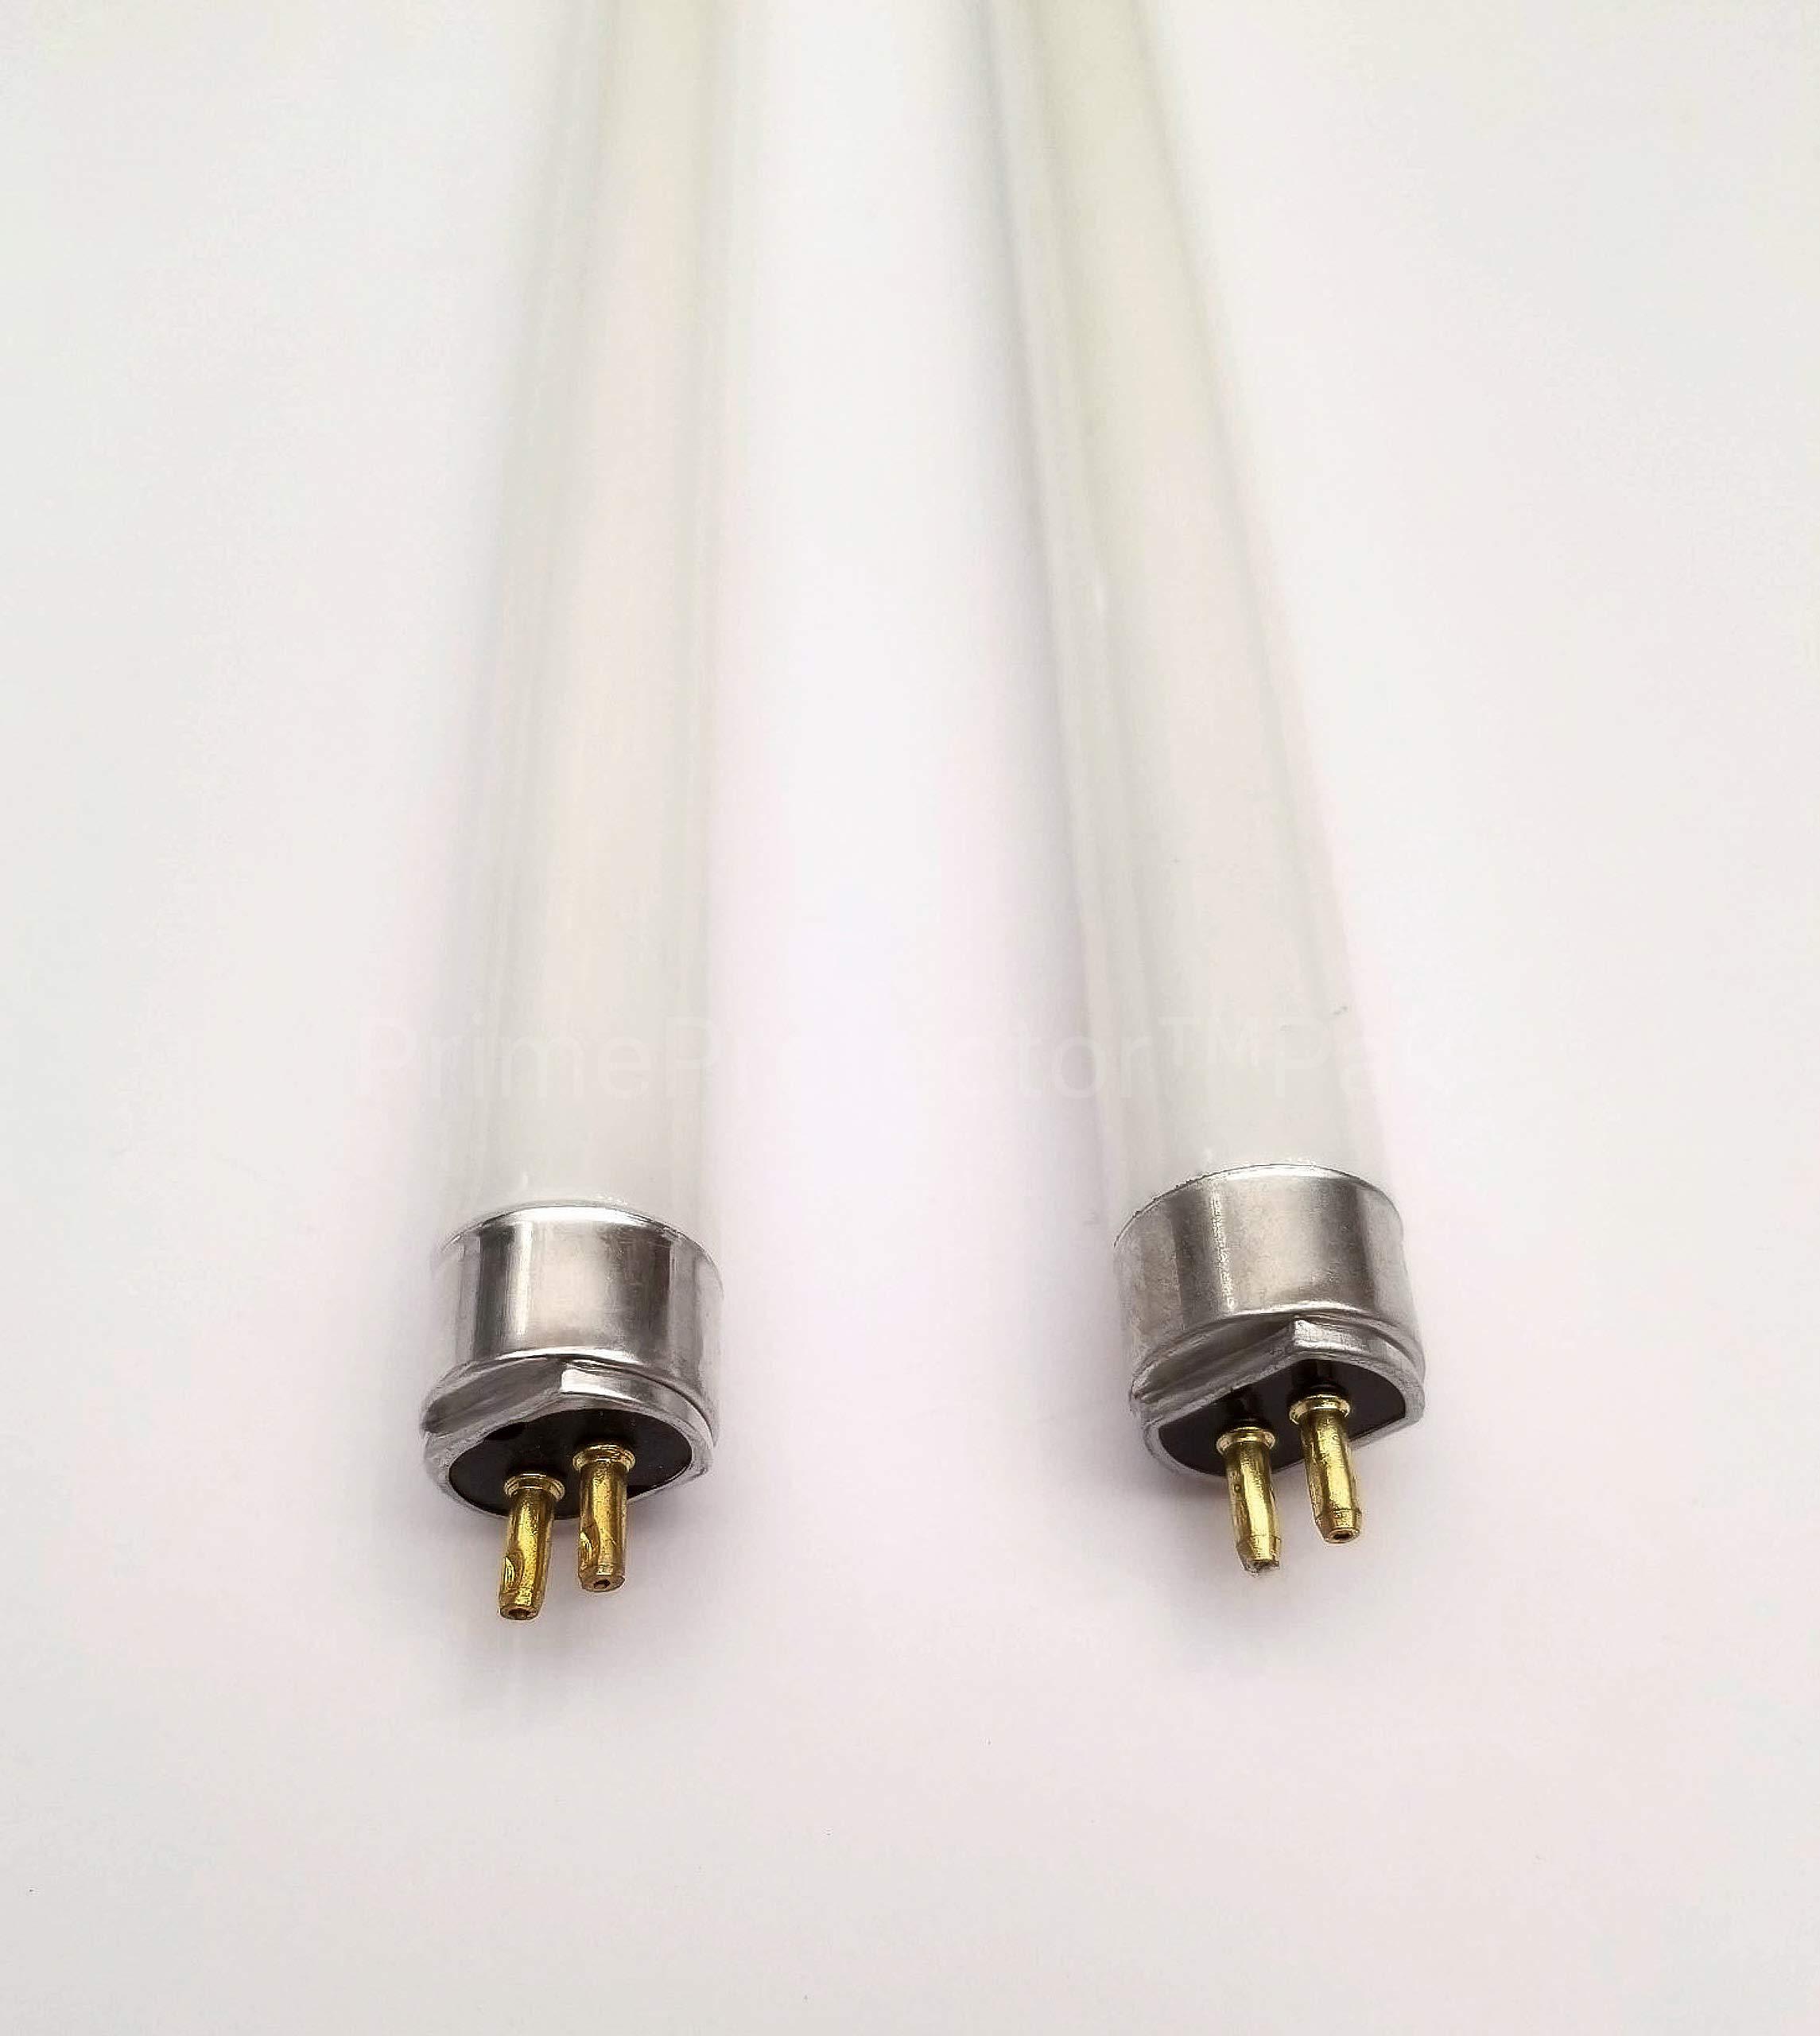 (2 Pack) GE 46735 - F35W/T5/841/ECO 35 Watt T5 Fluorescent Tube Light Bulb 35W F35T5-4100K Replaces FP35/841/ECO F35T5/841/ECO F35T5/741 FL35/T5/841